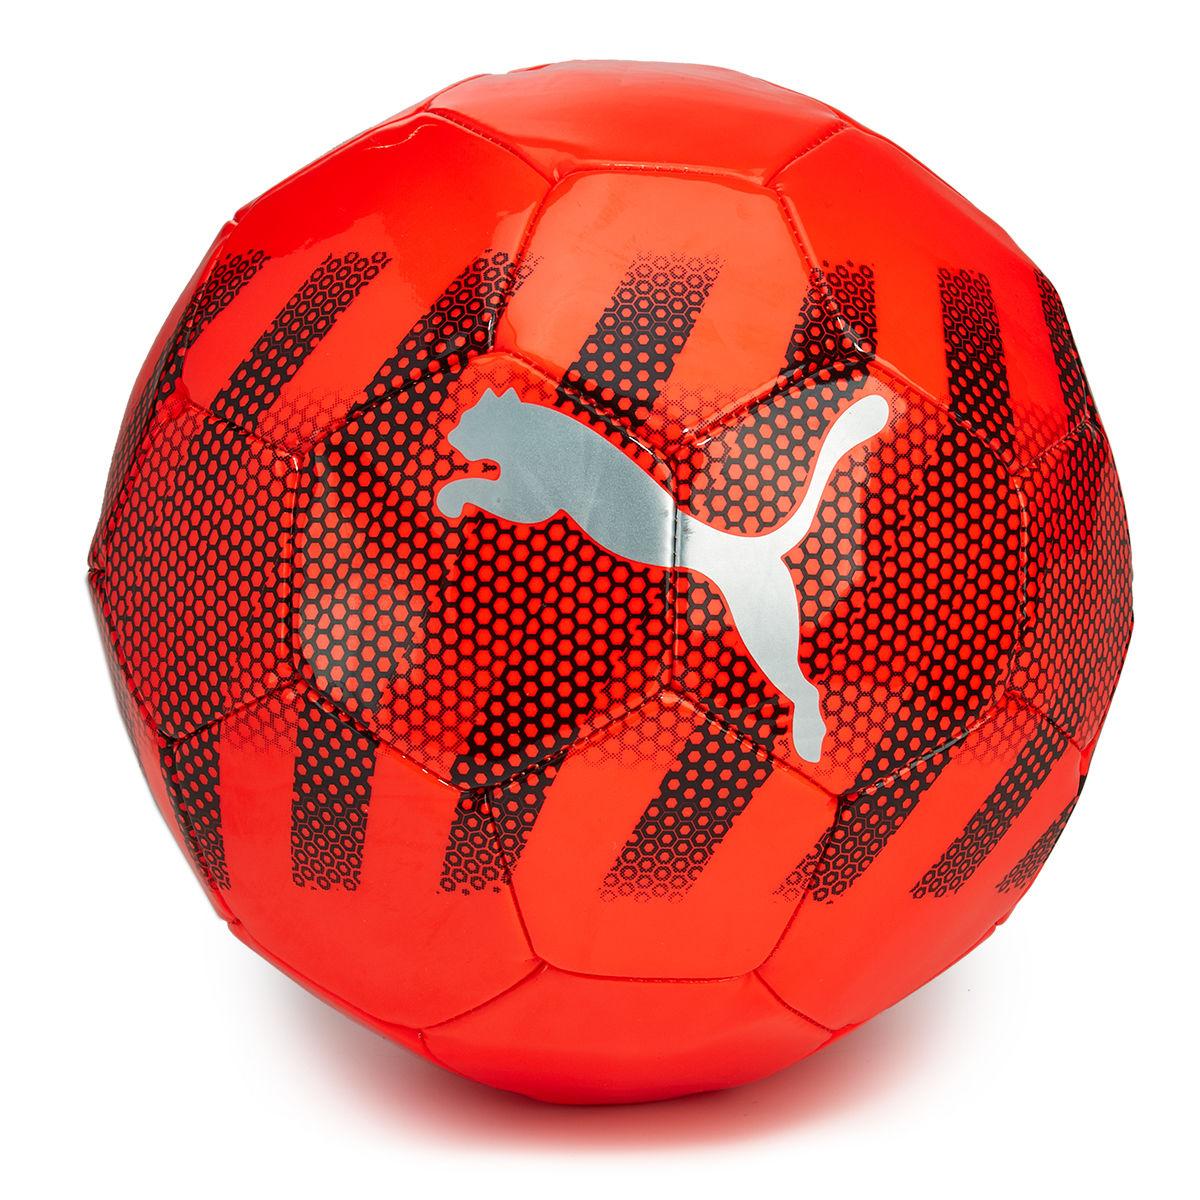 Puma Spirit Soccer Ball - Red, 4